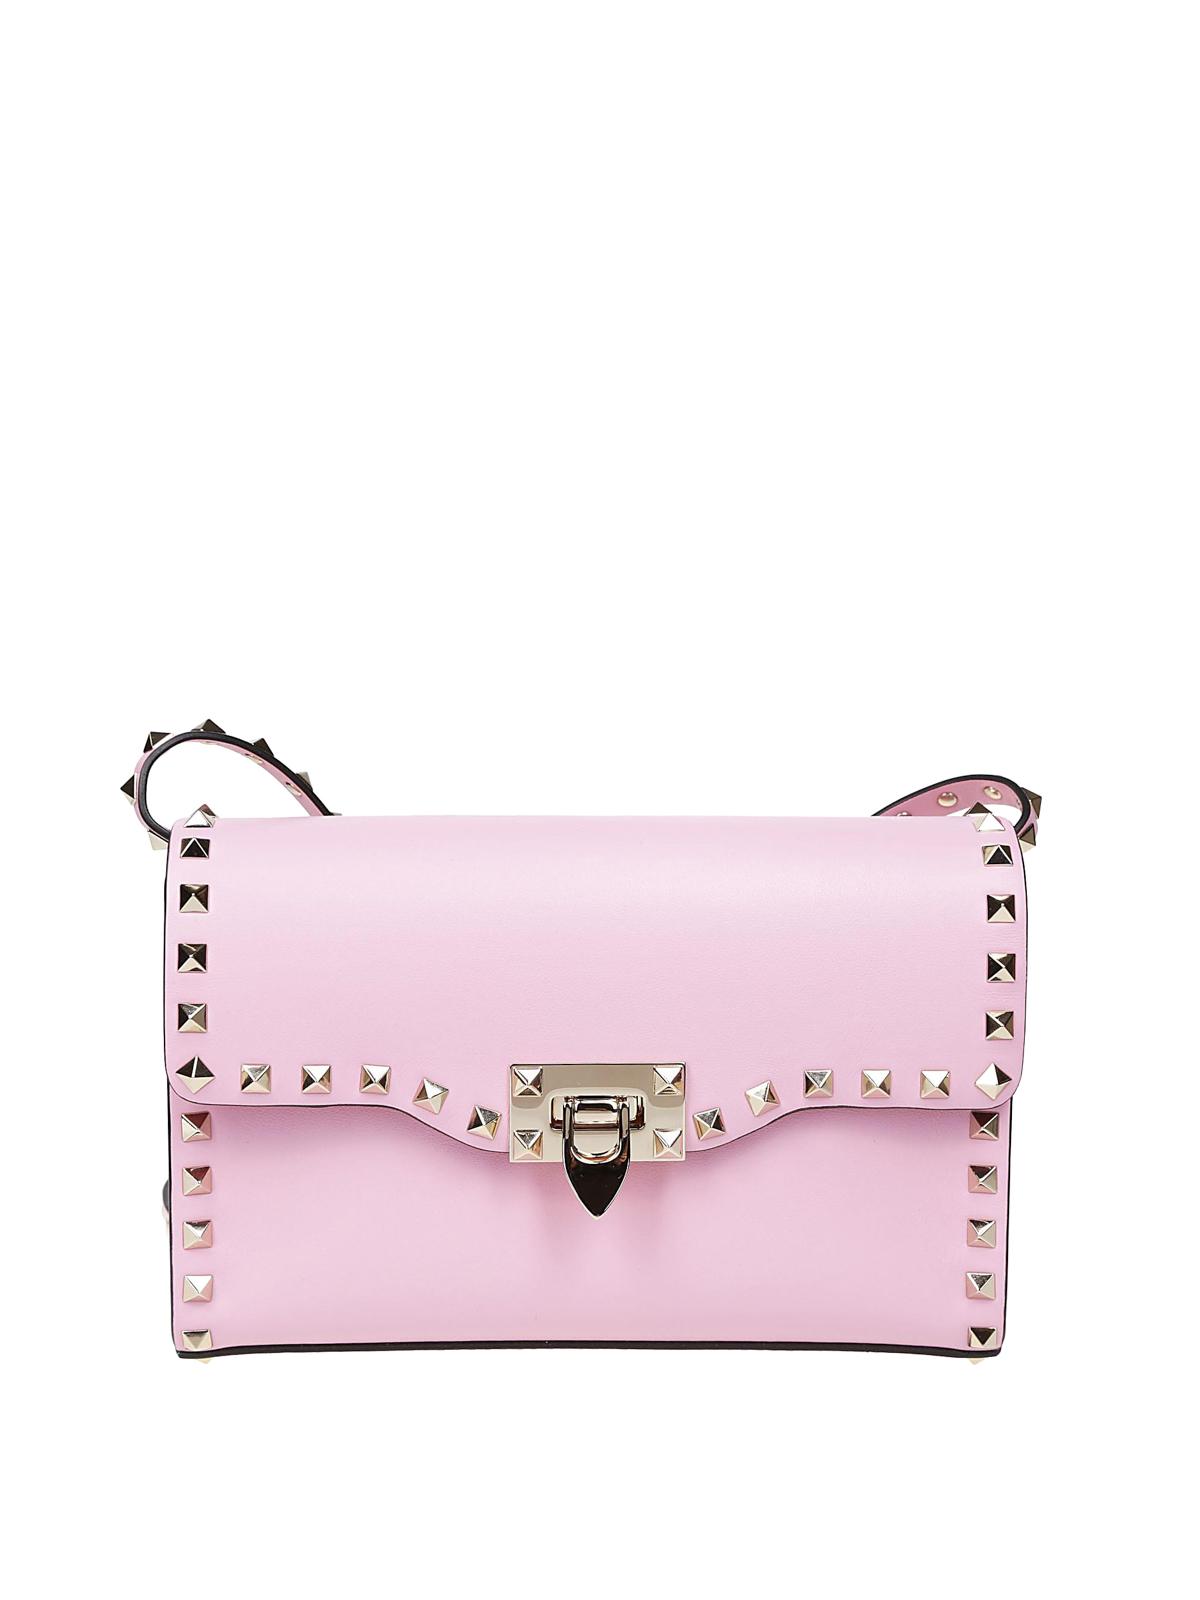 40868895fec8 VALENTINO GARAVANI  cross body bags - Rockstud pink smooth leather small bag